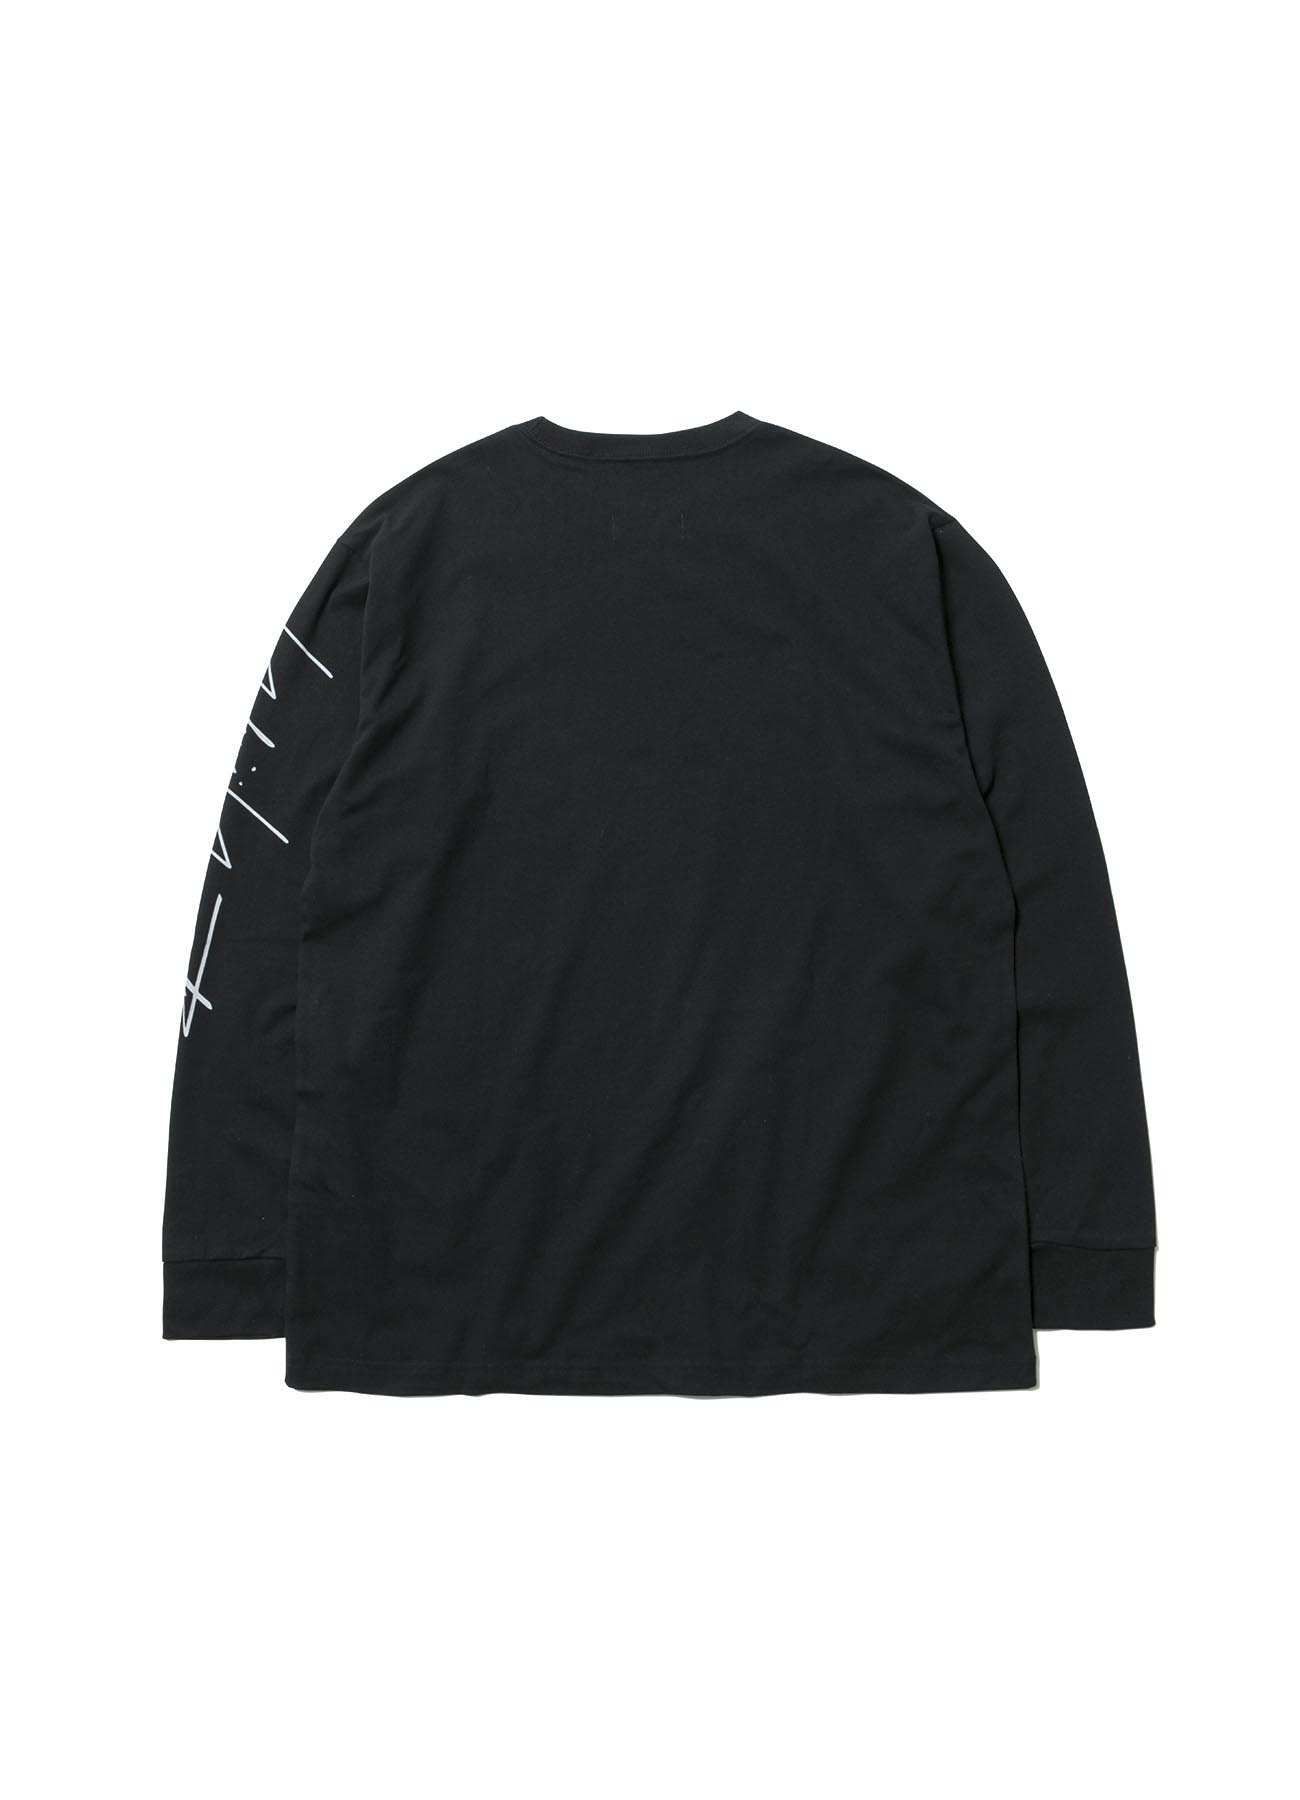 Yohji Yamamoto × New Era 左袖 シグネチャープリント 長袖TEE